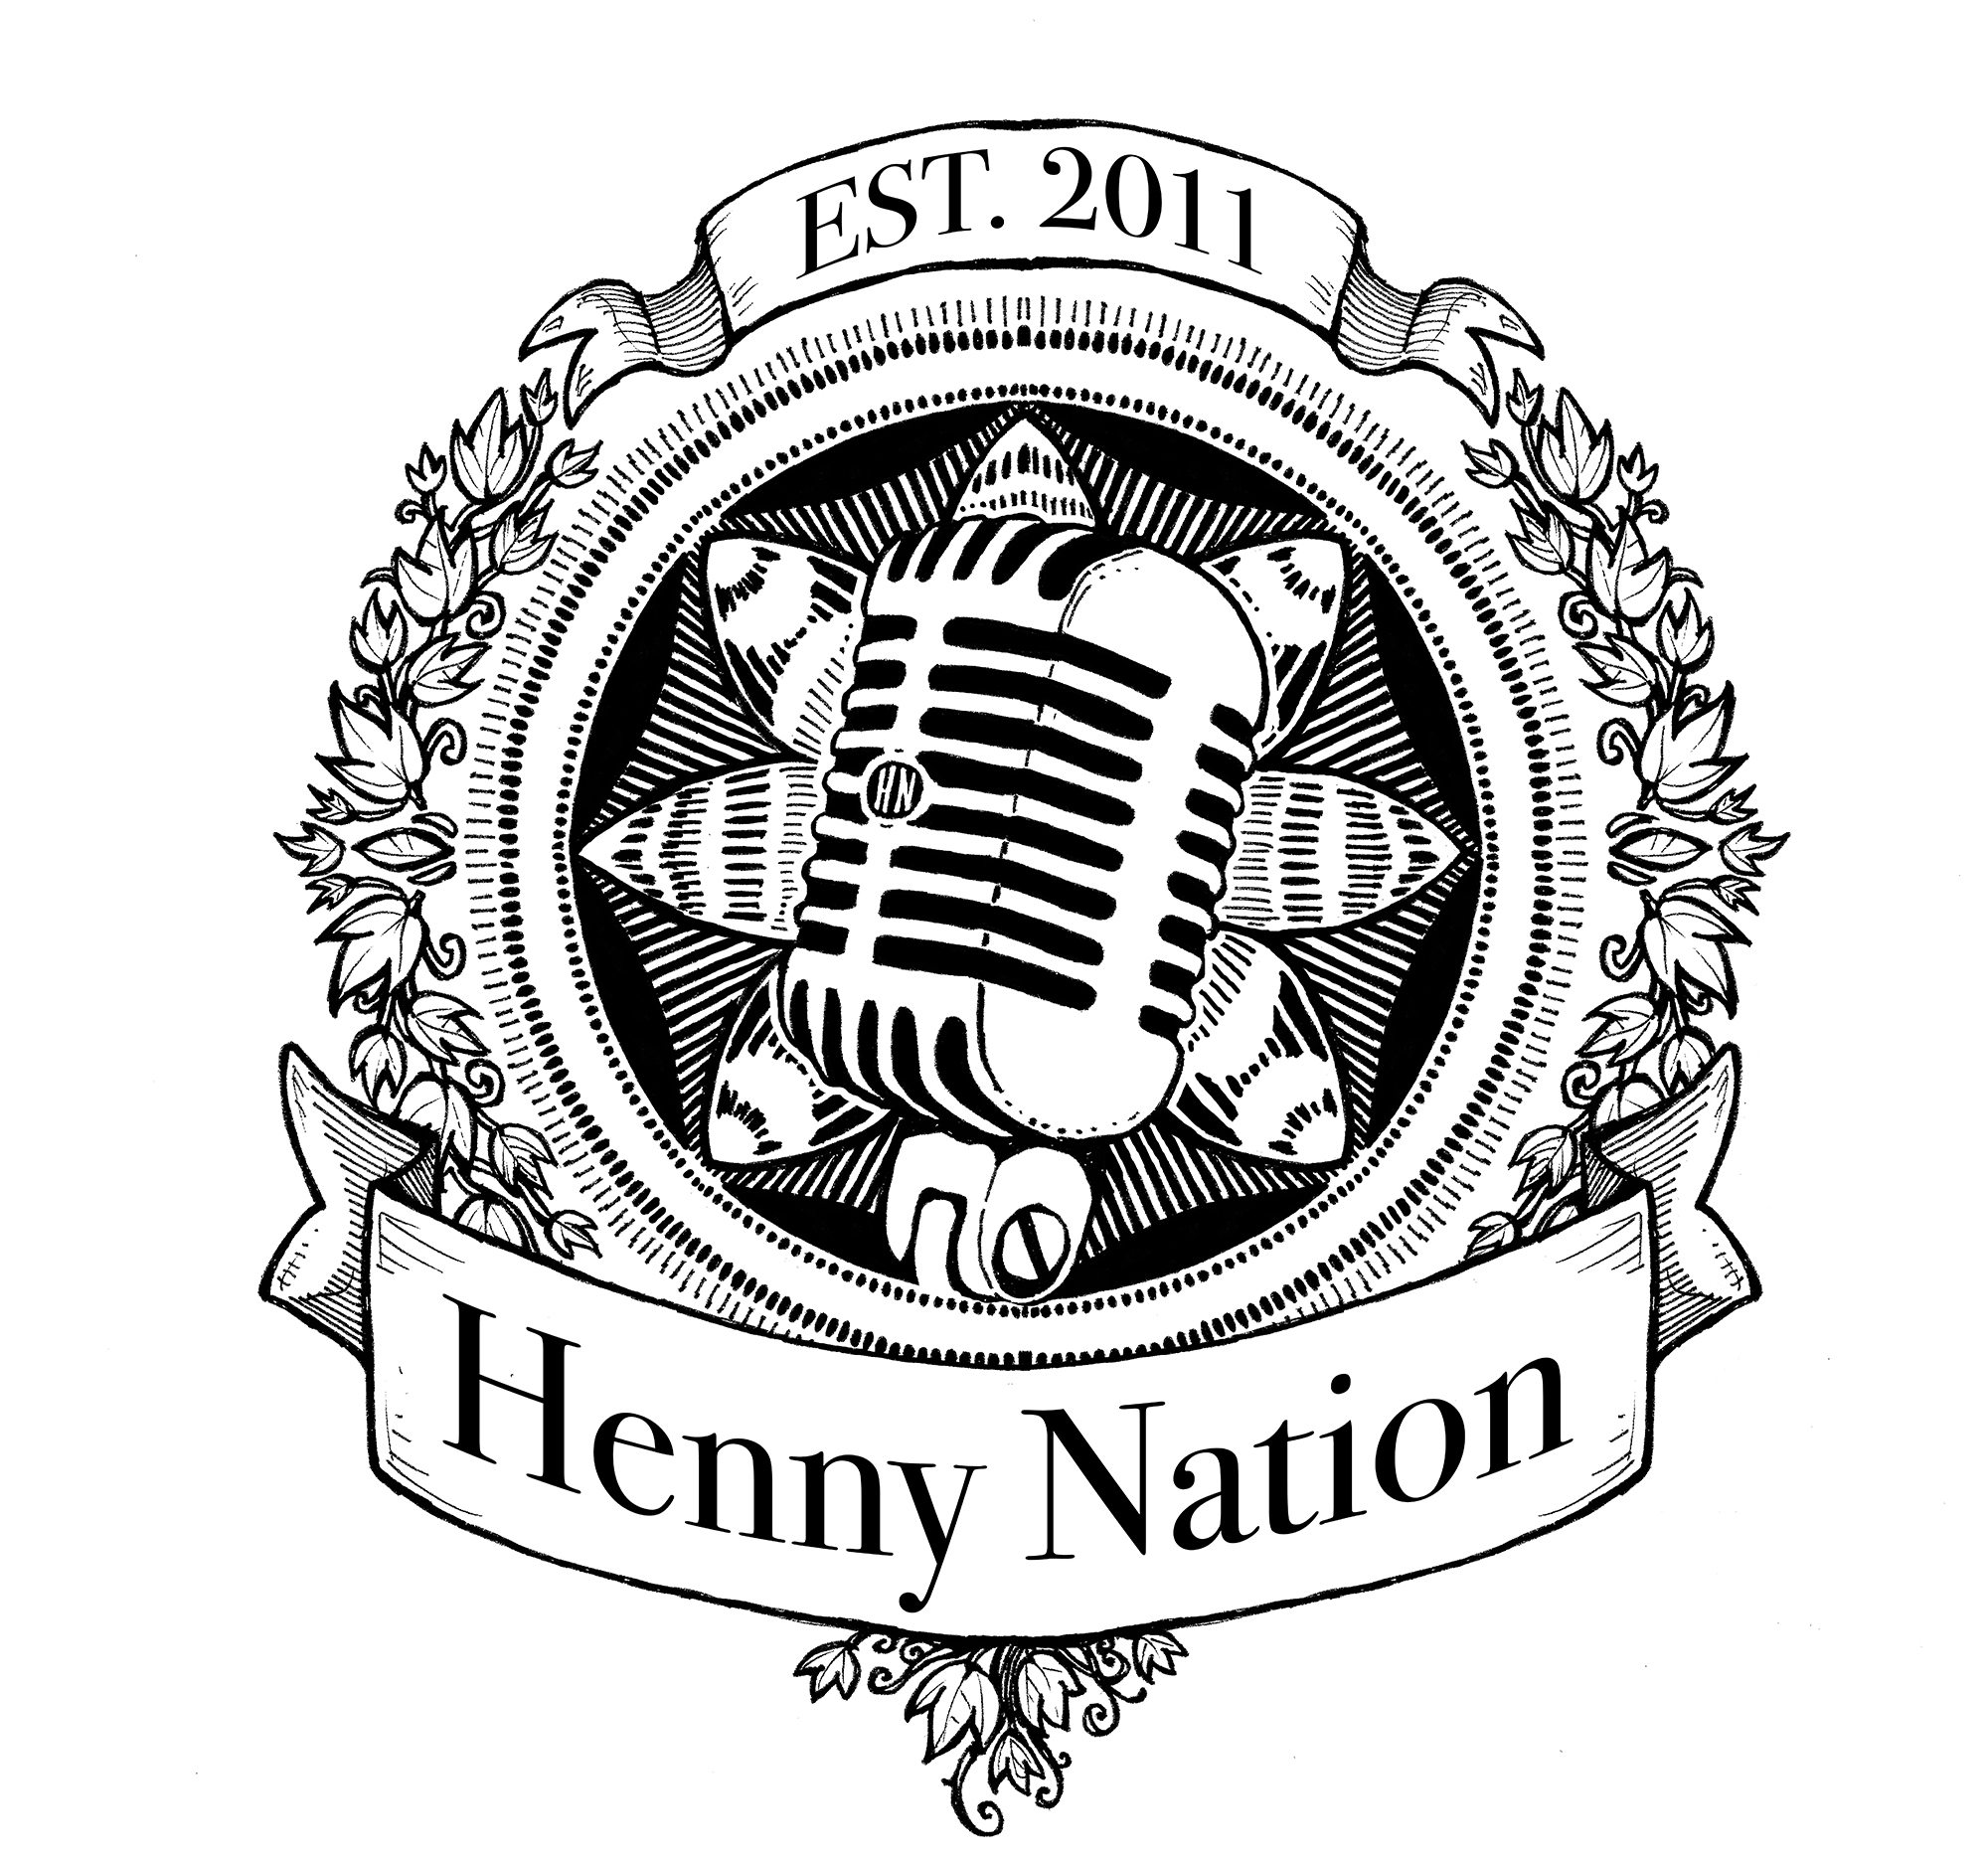 Henny Nation Band Logo